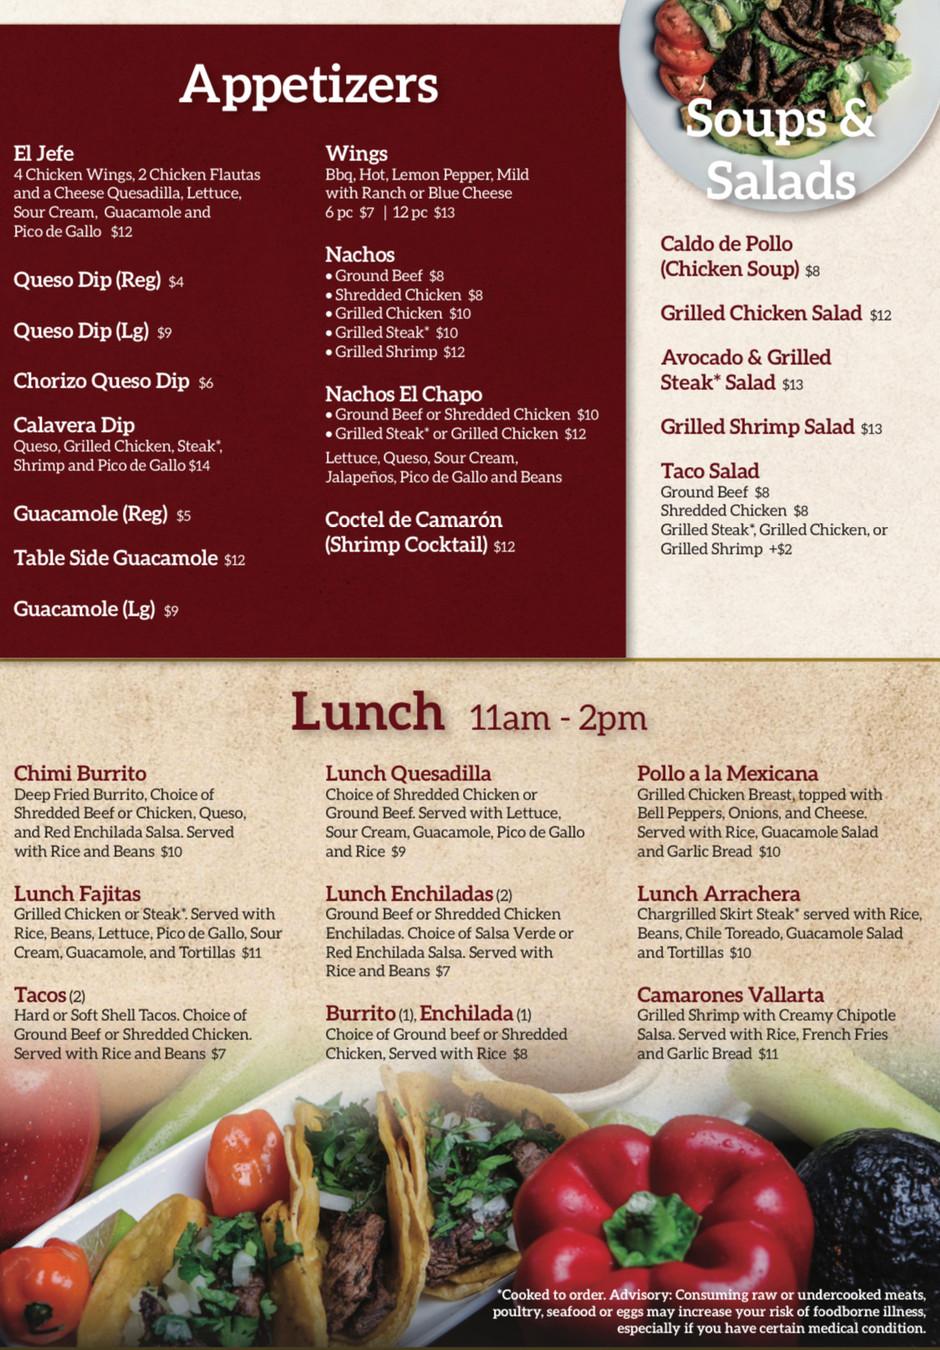 Appetizers, Soups & Salad, Lunch